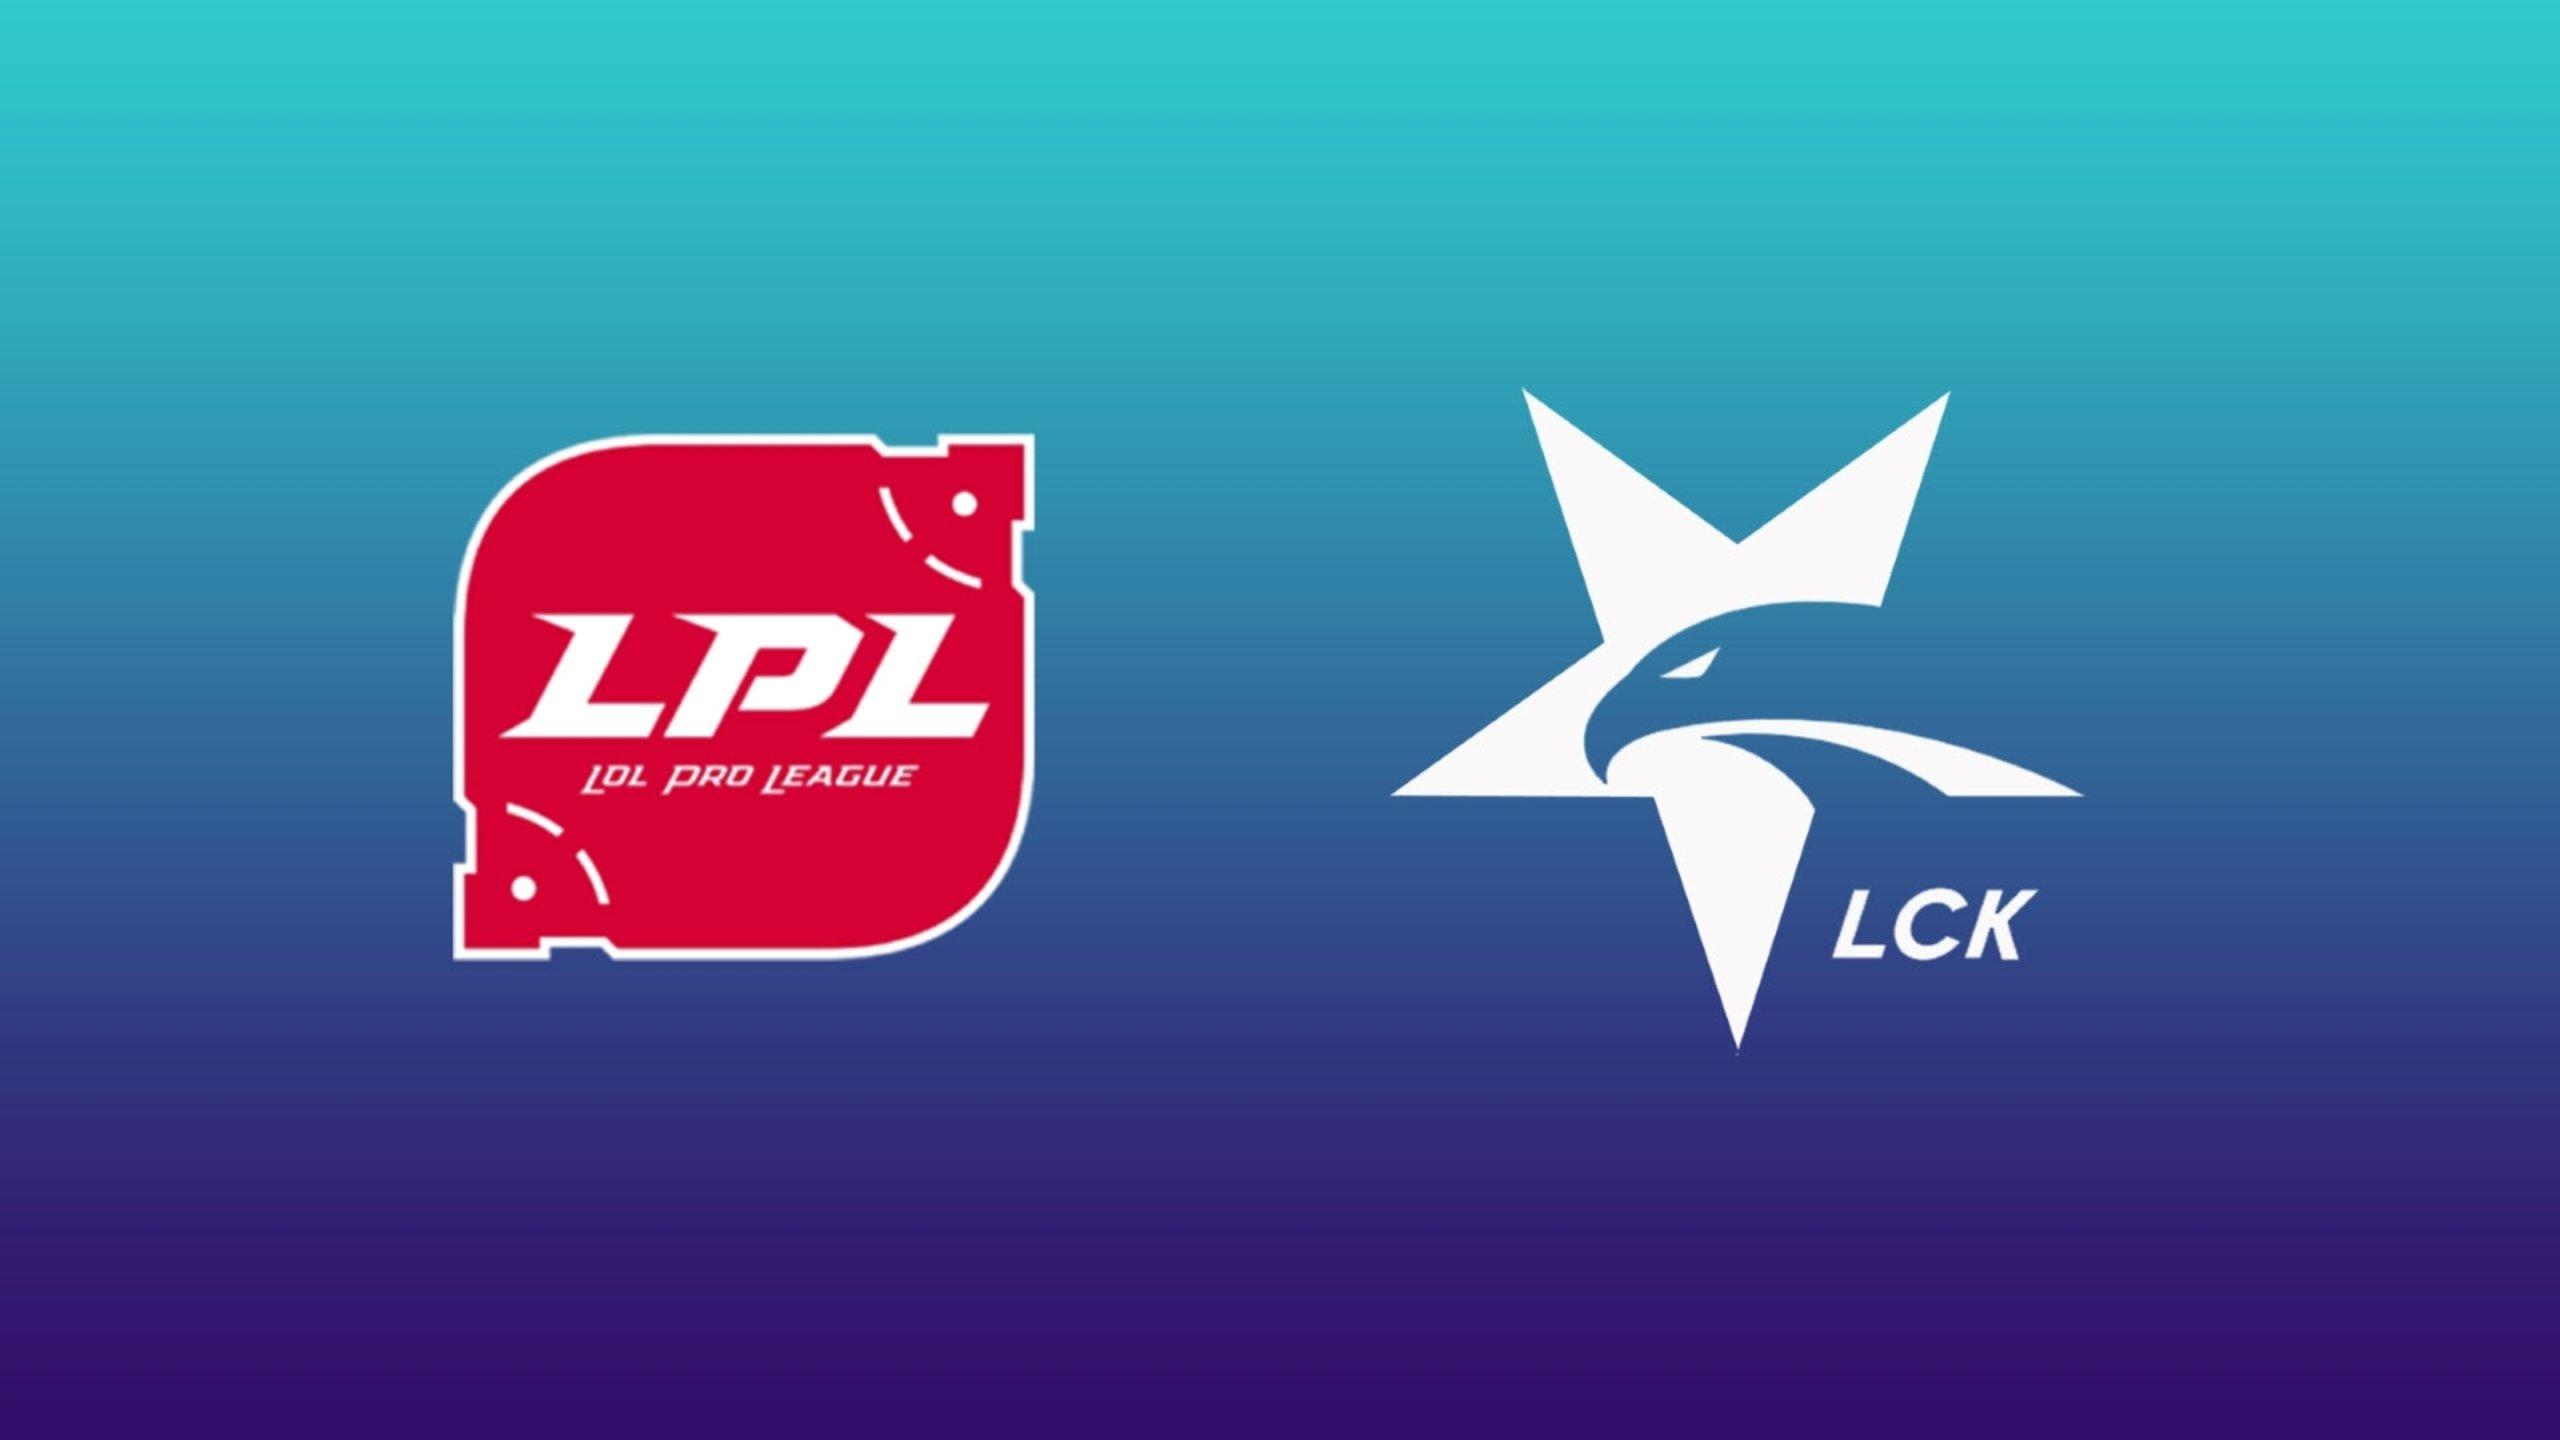 Mid Season cup 2020 league of legends